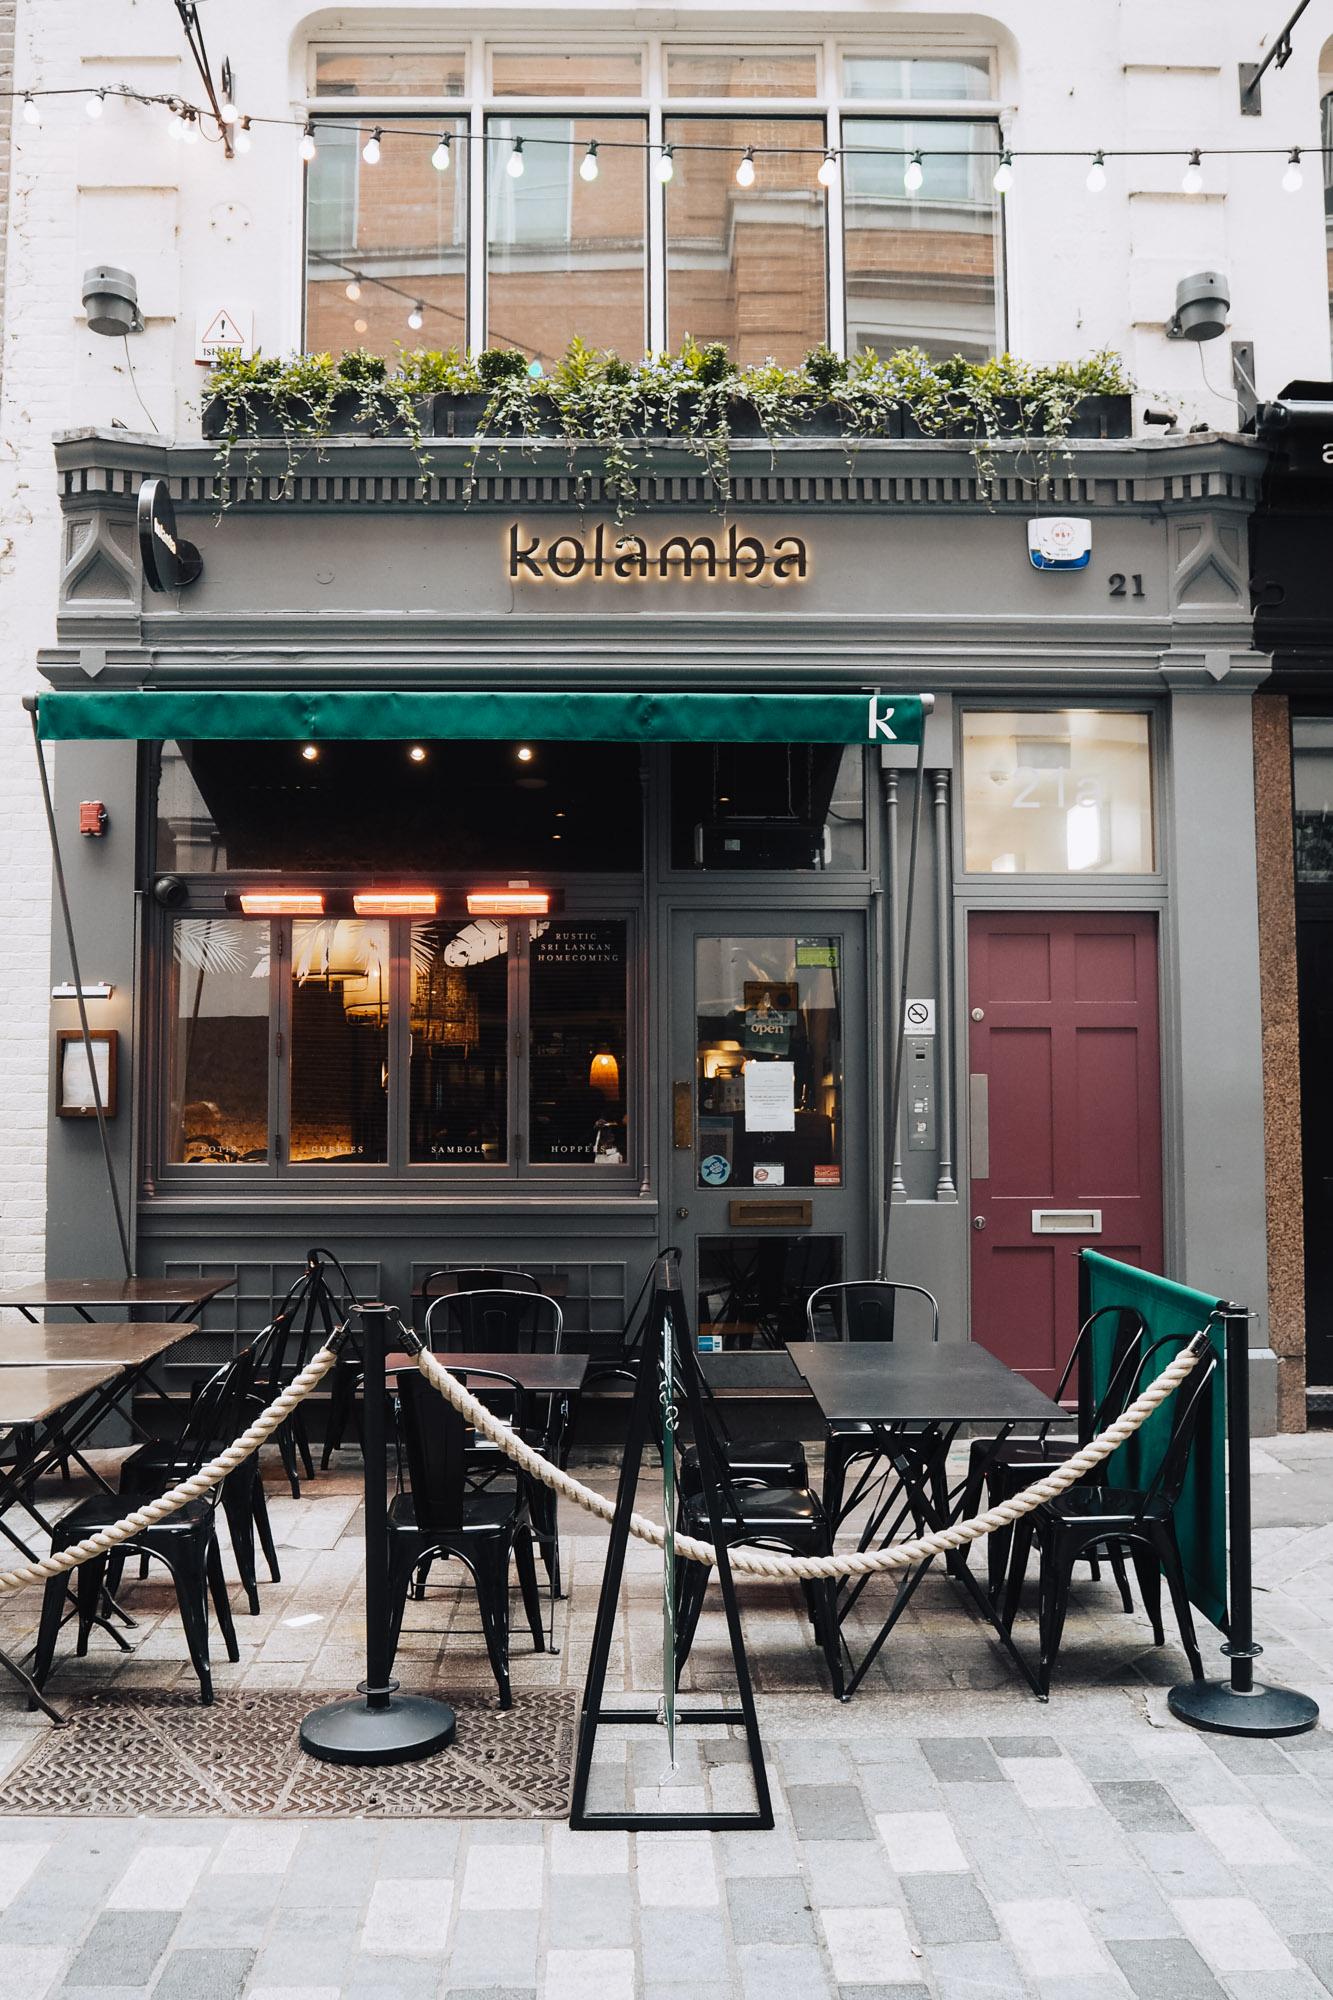 Kolamba, a Sri Lankan restaurant in Soho, London